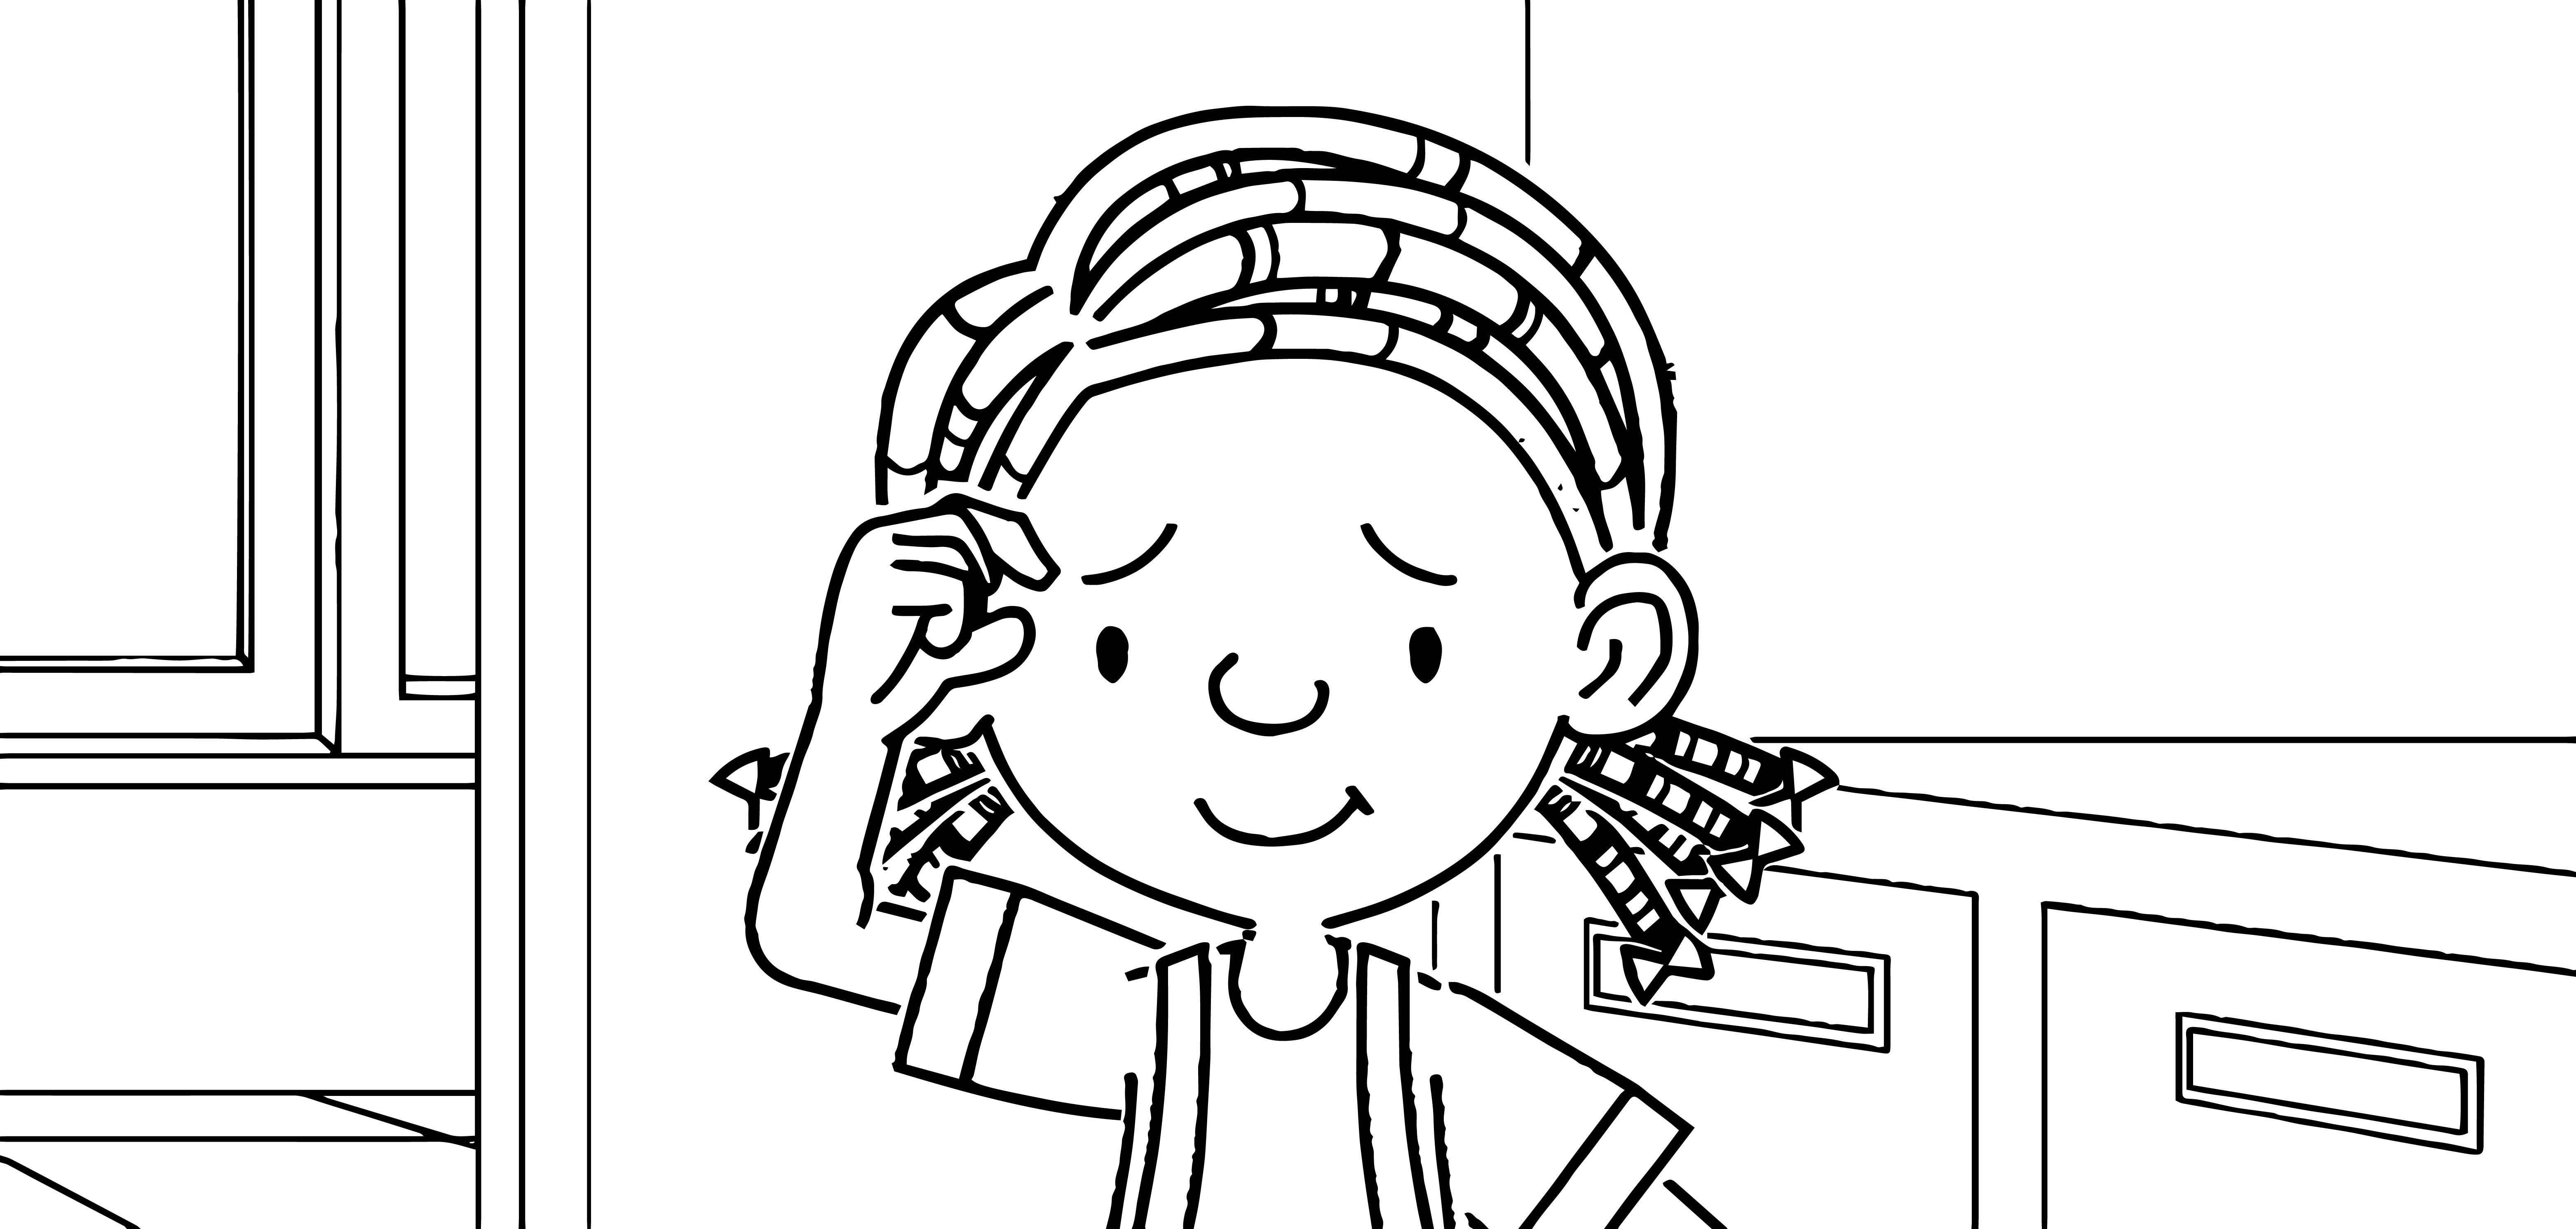 Speaking Cartoon Kids Coloring Page 55